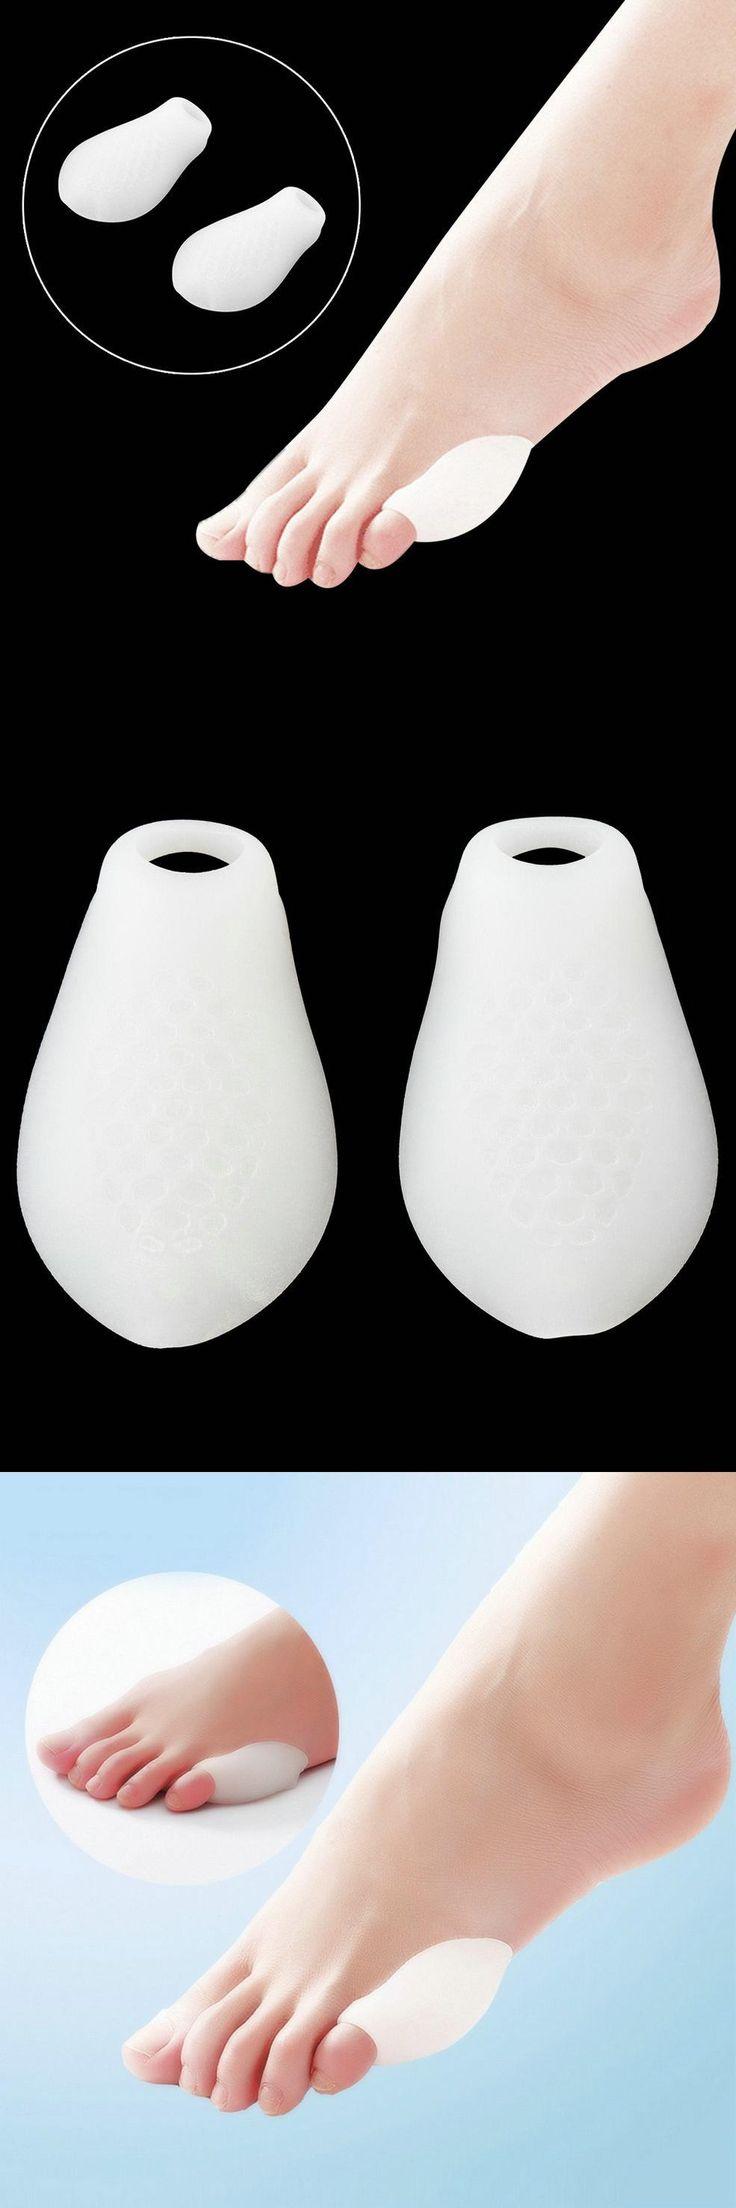 [Visit to Buy] 2X Little Toe Bunion Protectors Pads Feet Foot Pain Relief Corn Callus Latex Gel Wholesale Beauty #Advertisement